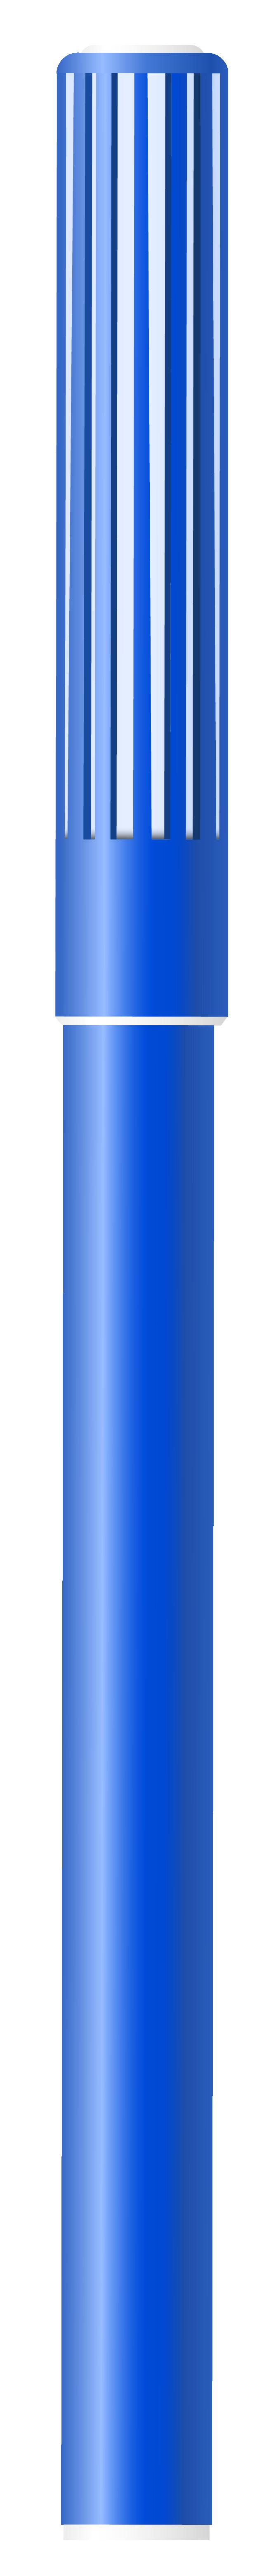 Blue Felt Tip Pen PNG Clipart Image.